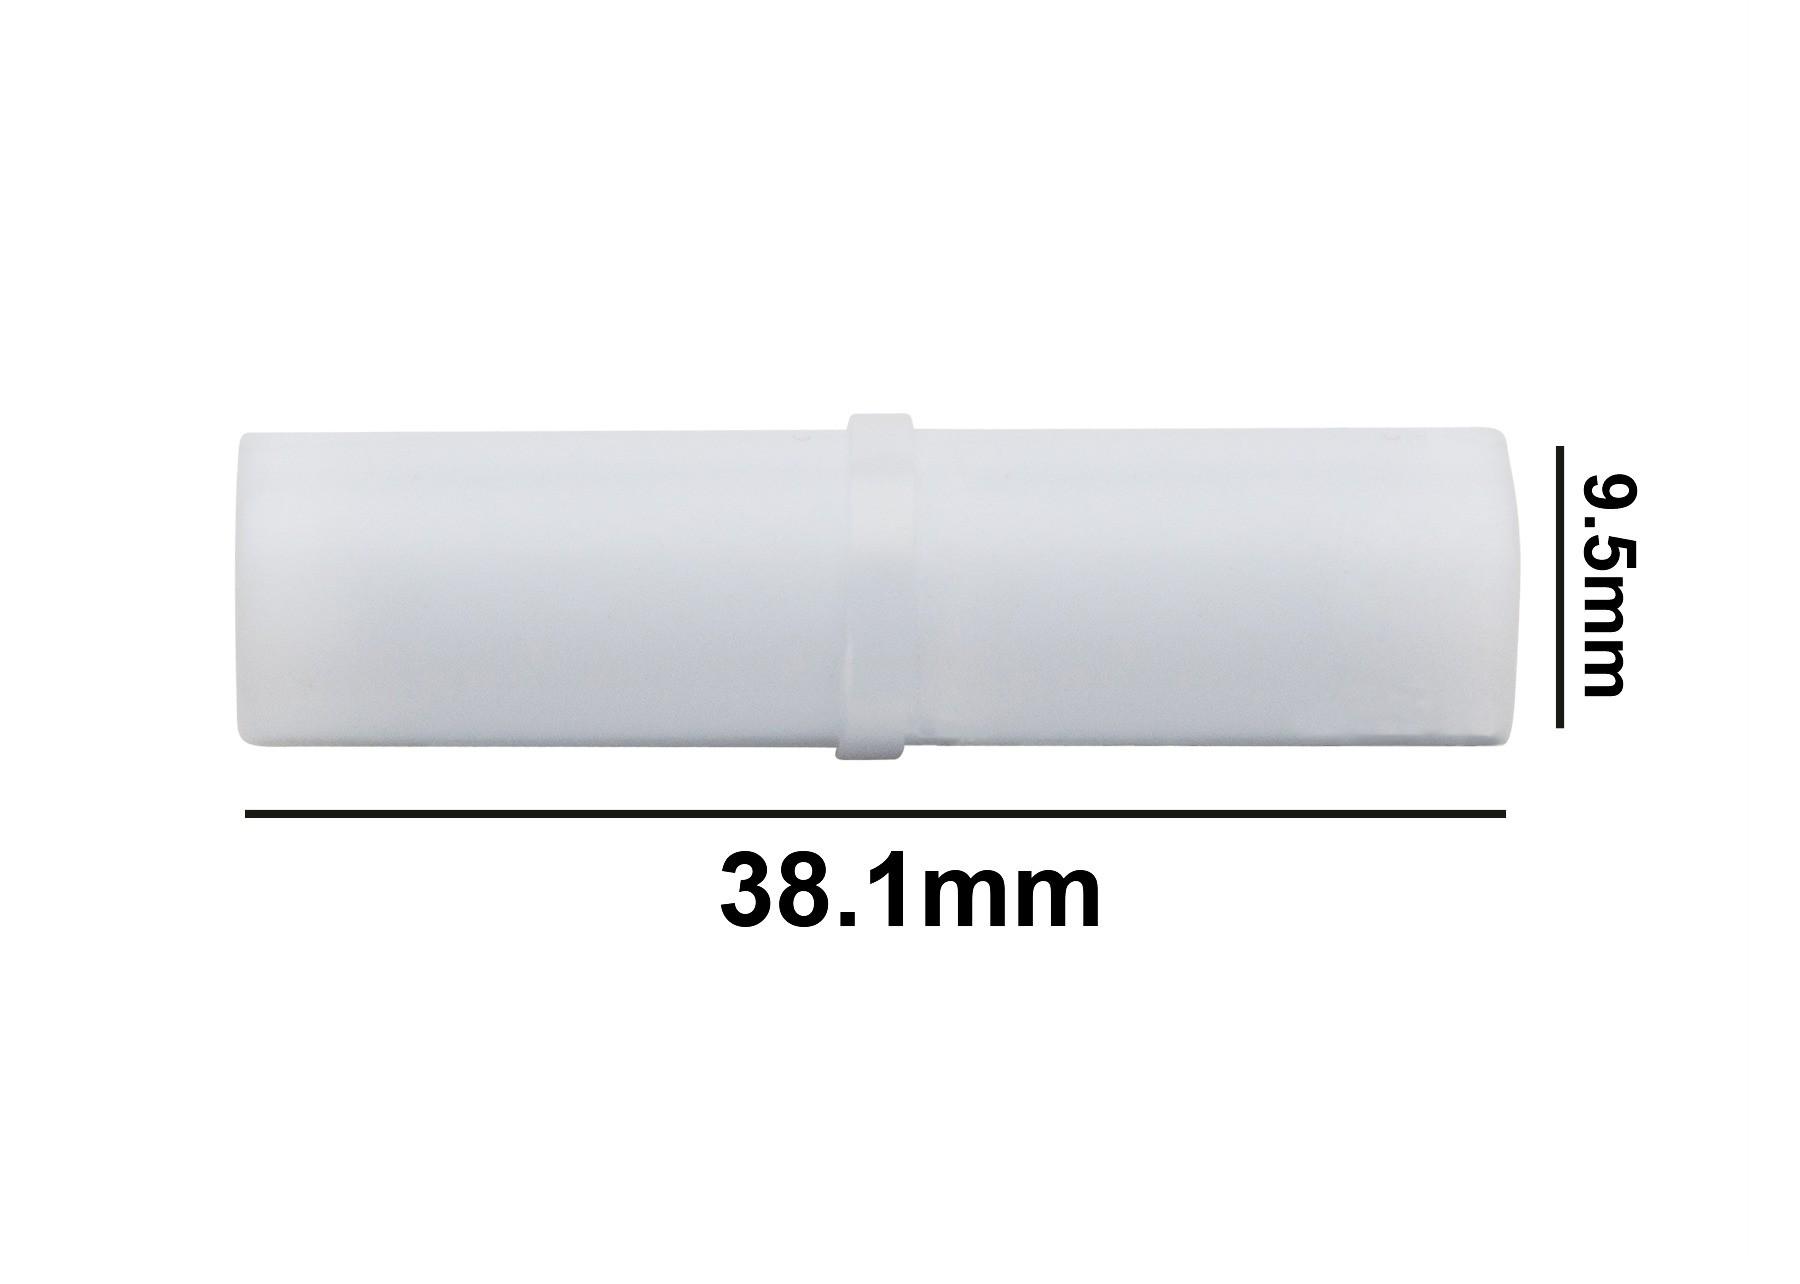 SP Bel-Art Spinbar Teflon Cylindrical Magnetic Stirring Bar; 38.1 x 9.5mm, White